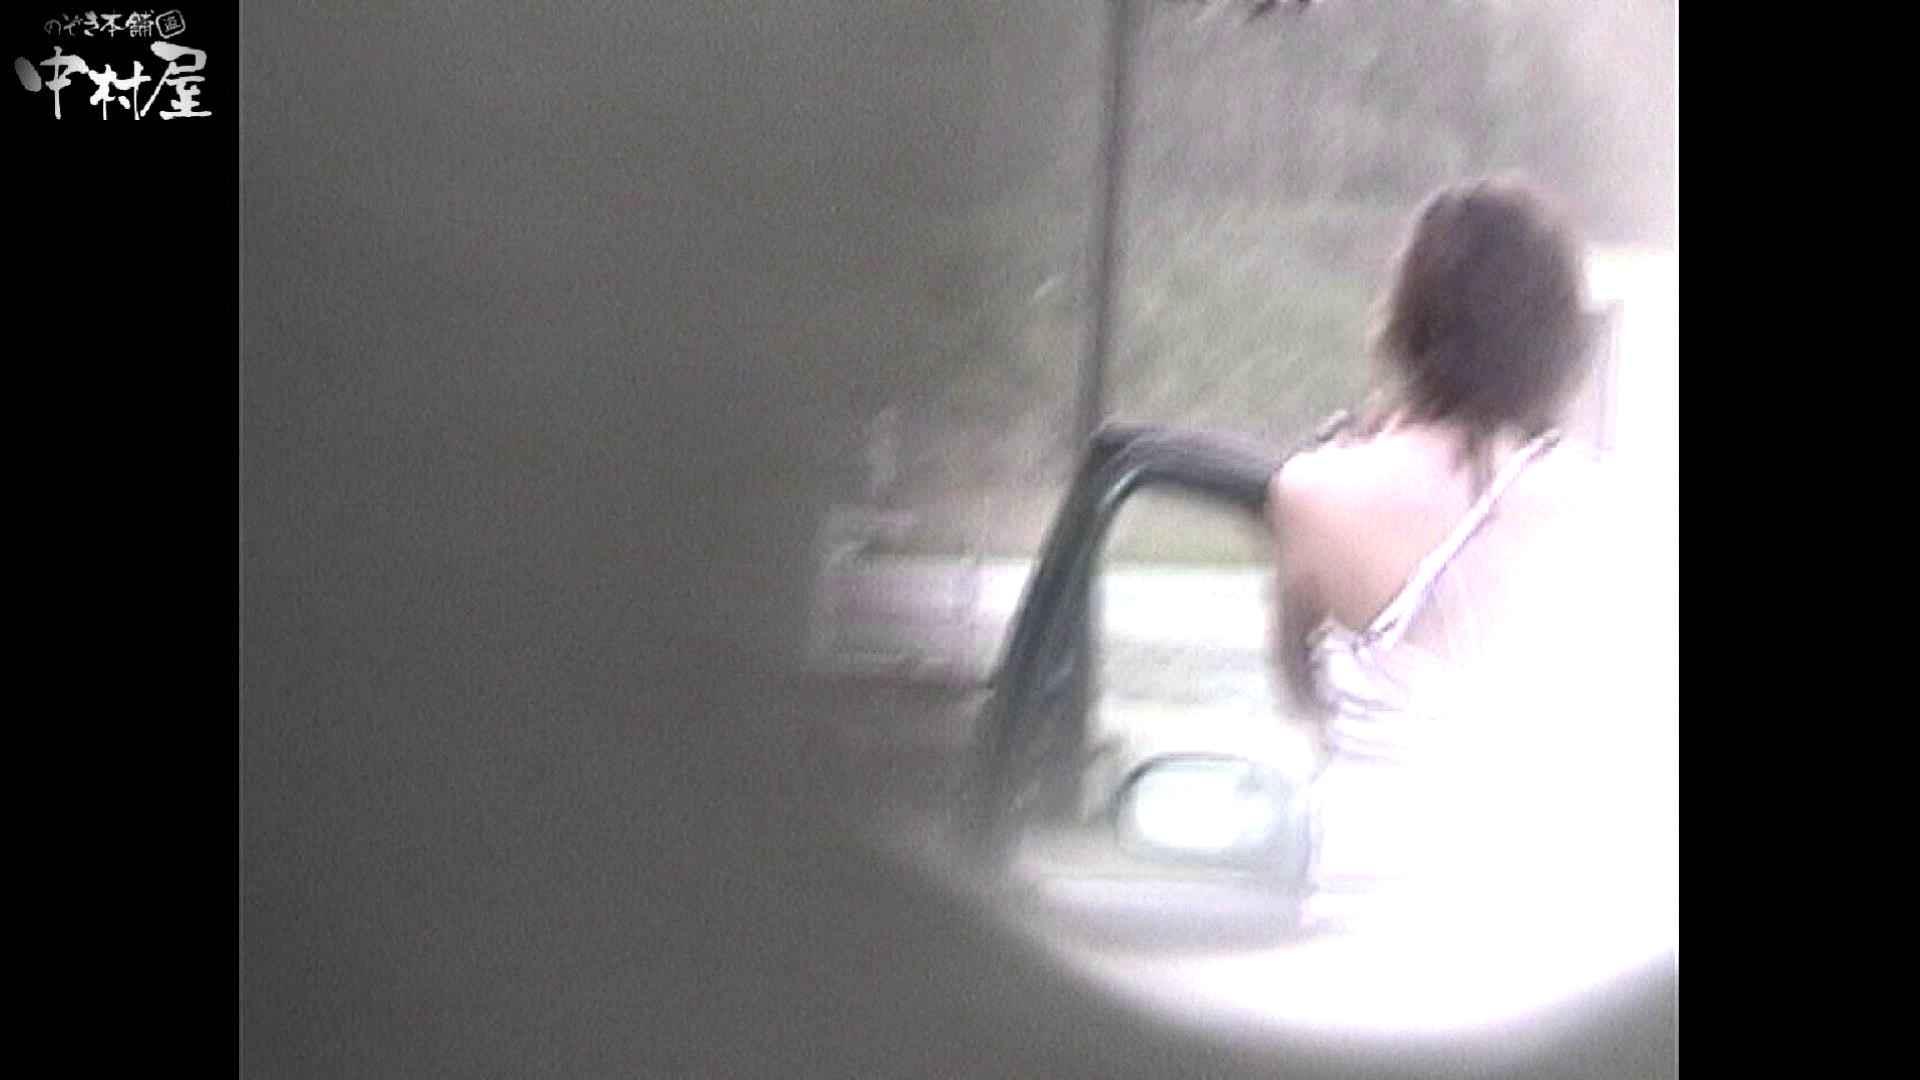 No.16 アニマル柄の水着 レースのパンツにナプキンを装着する金髪お姉さん ナプキン  63連発 56